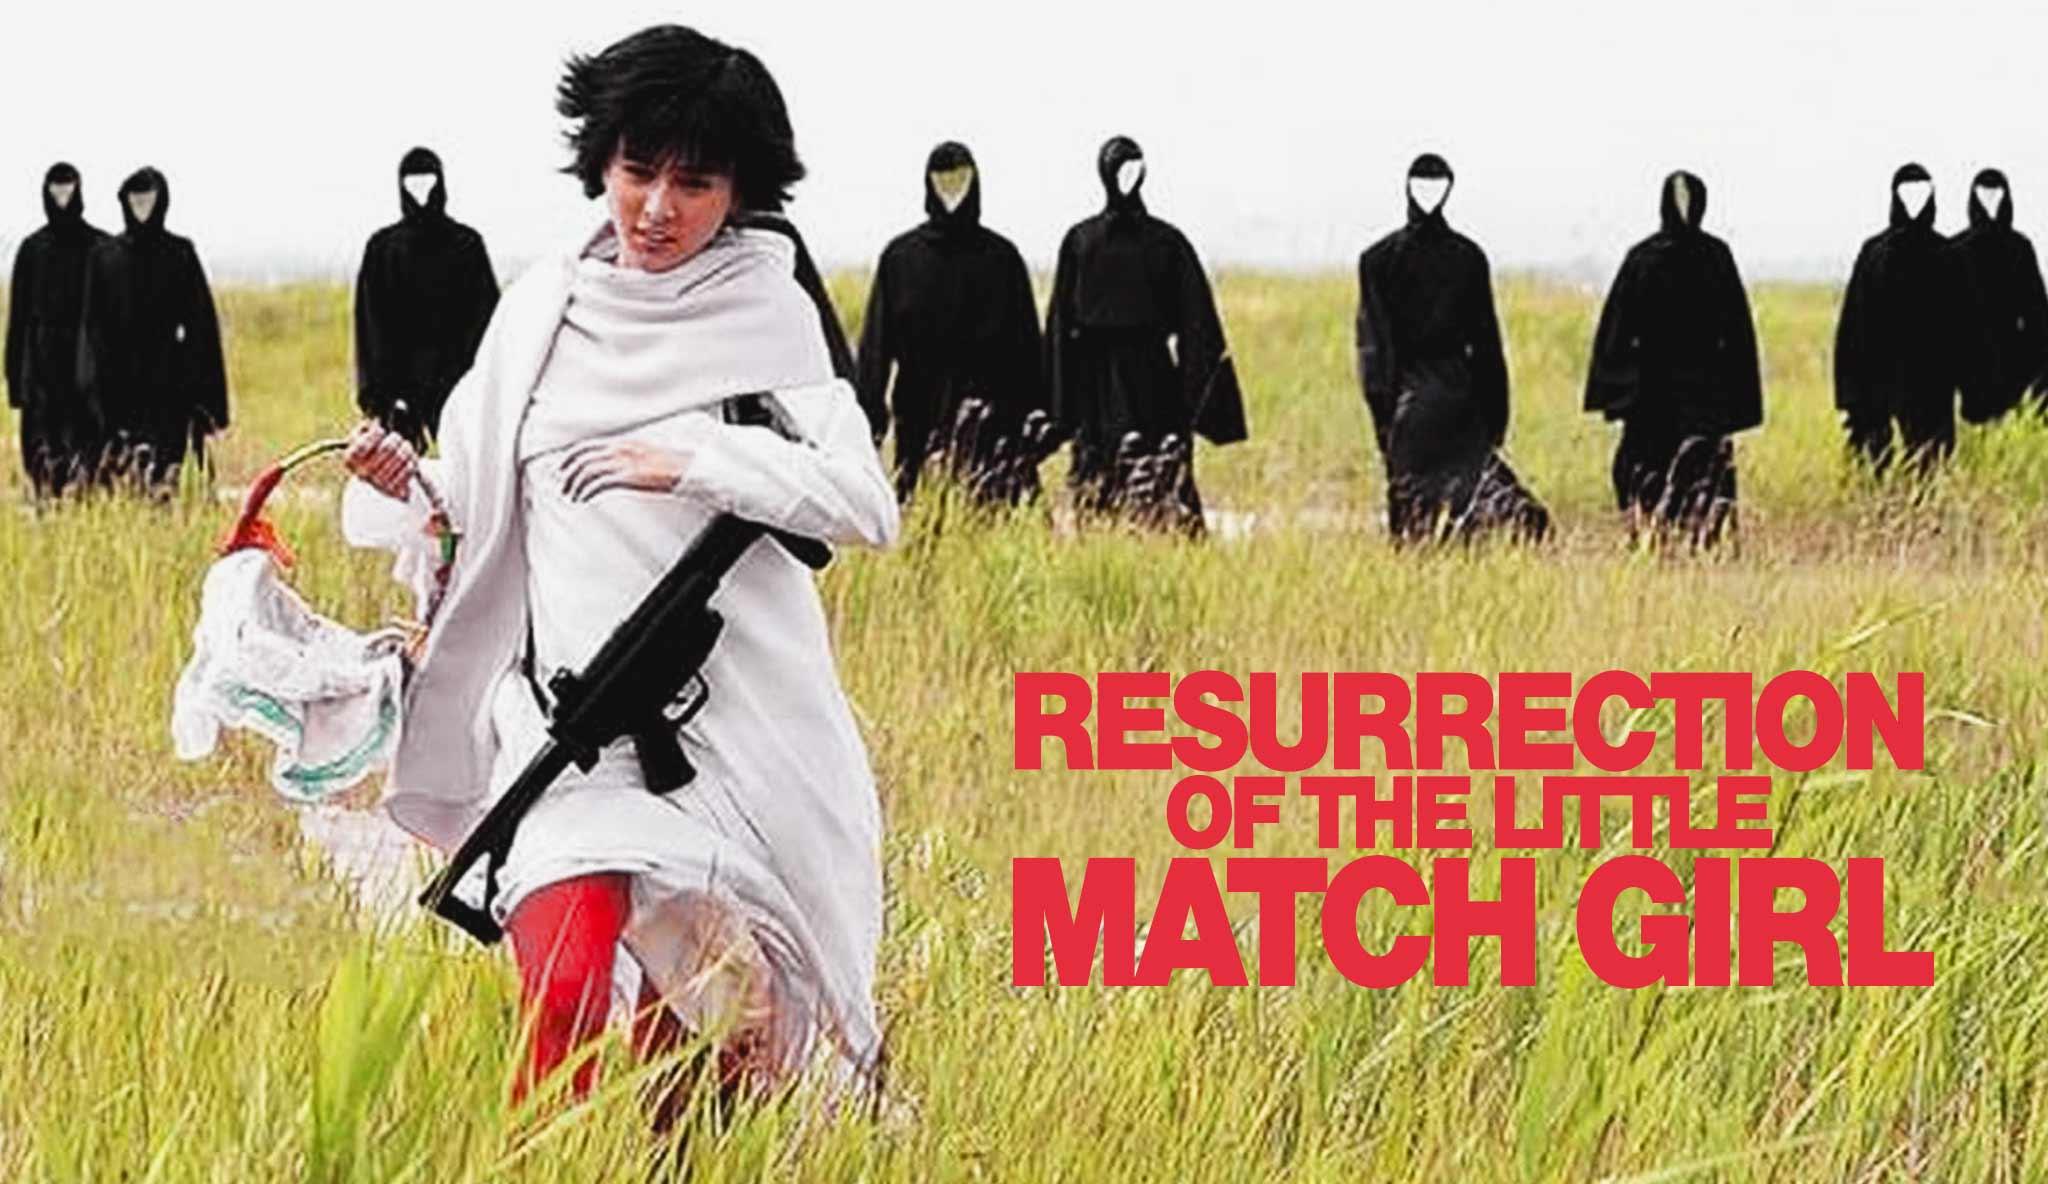 resurrection-of-the-little-matchgirl\header.jpg